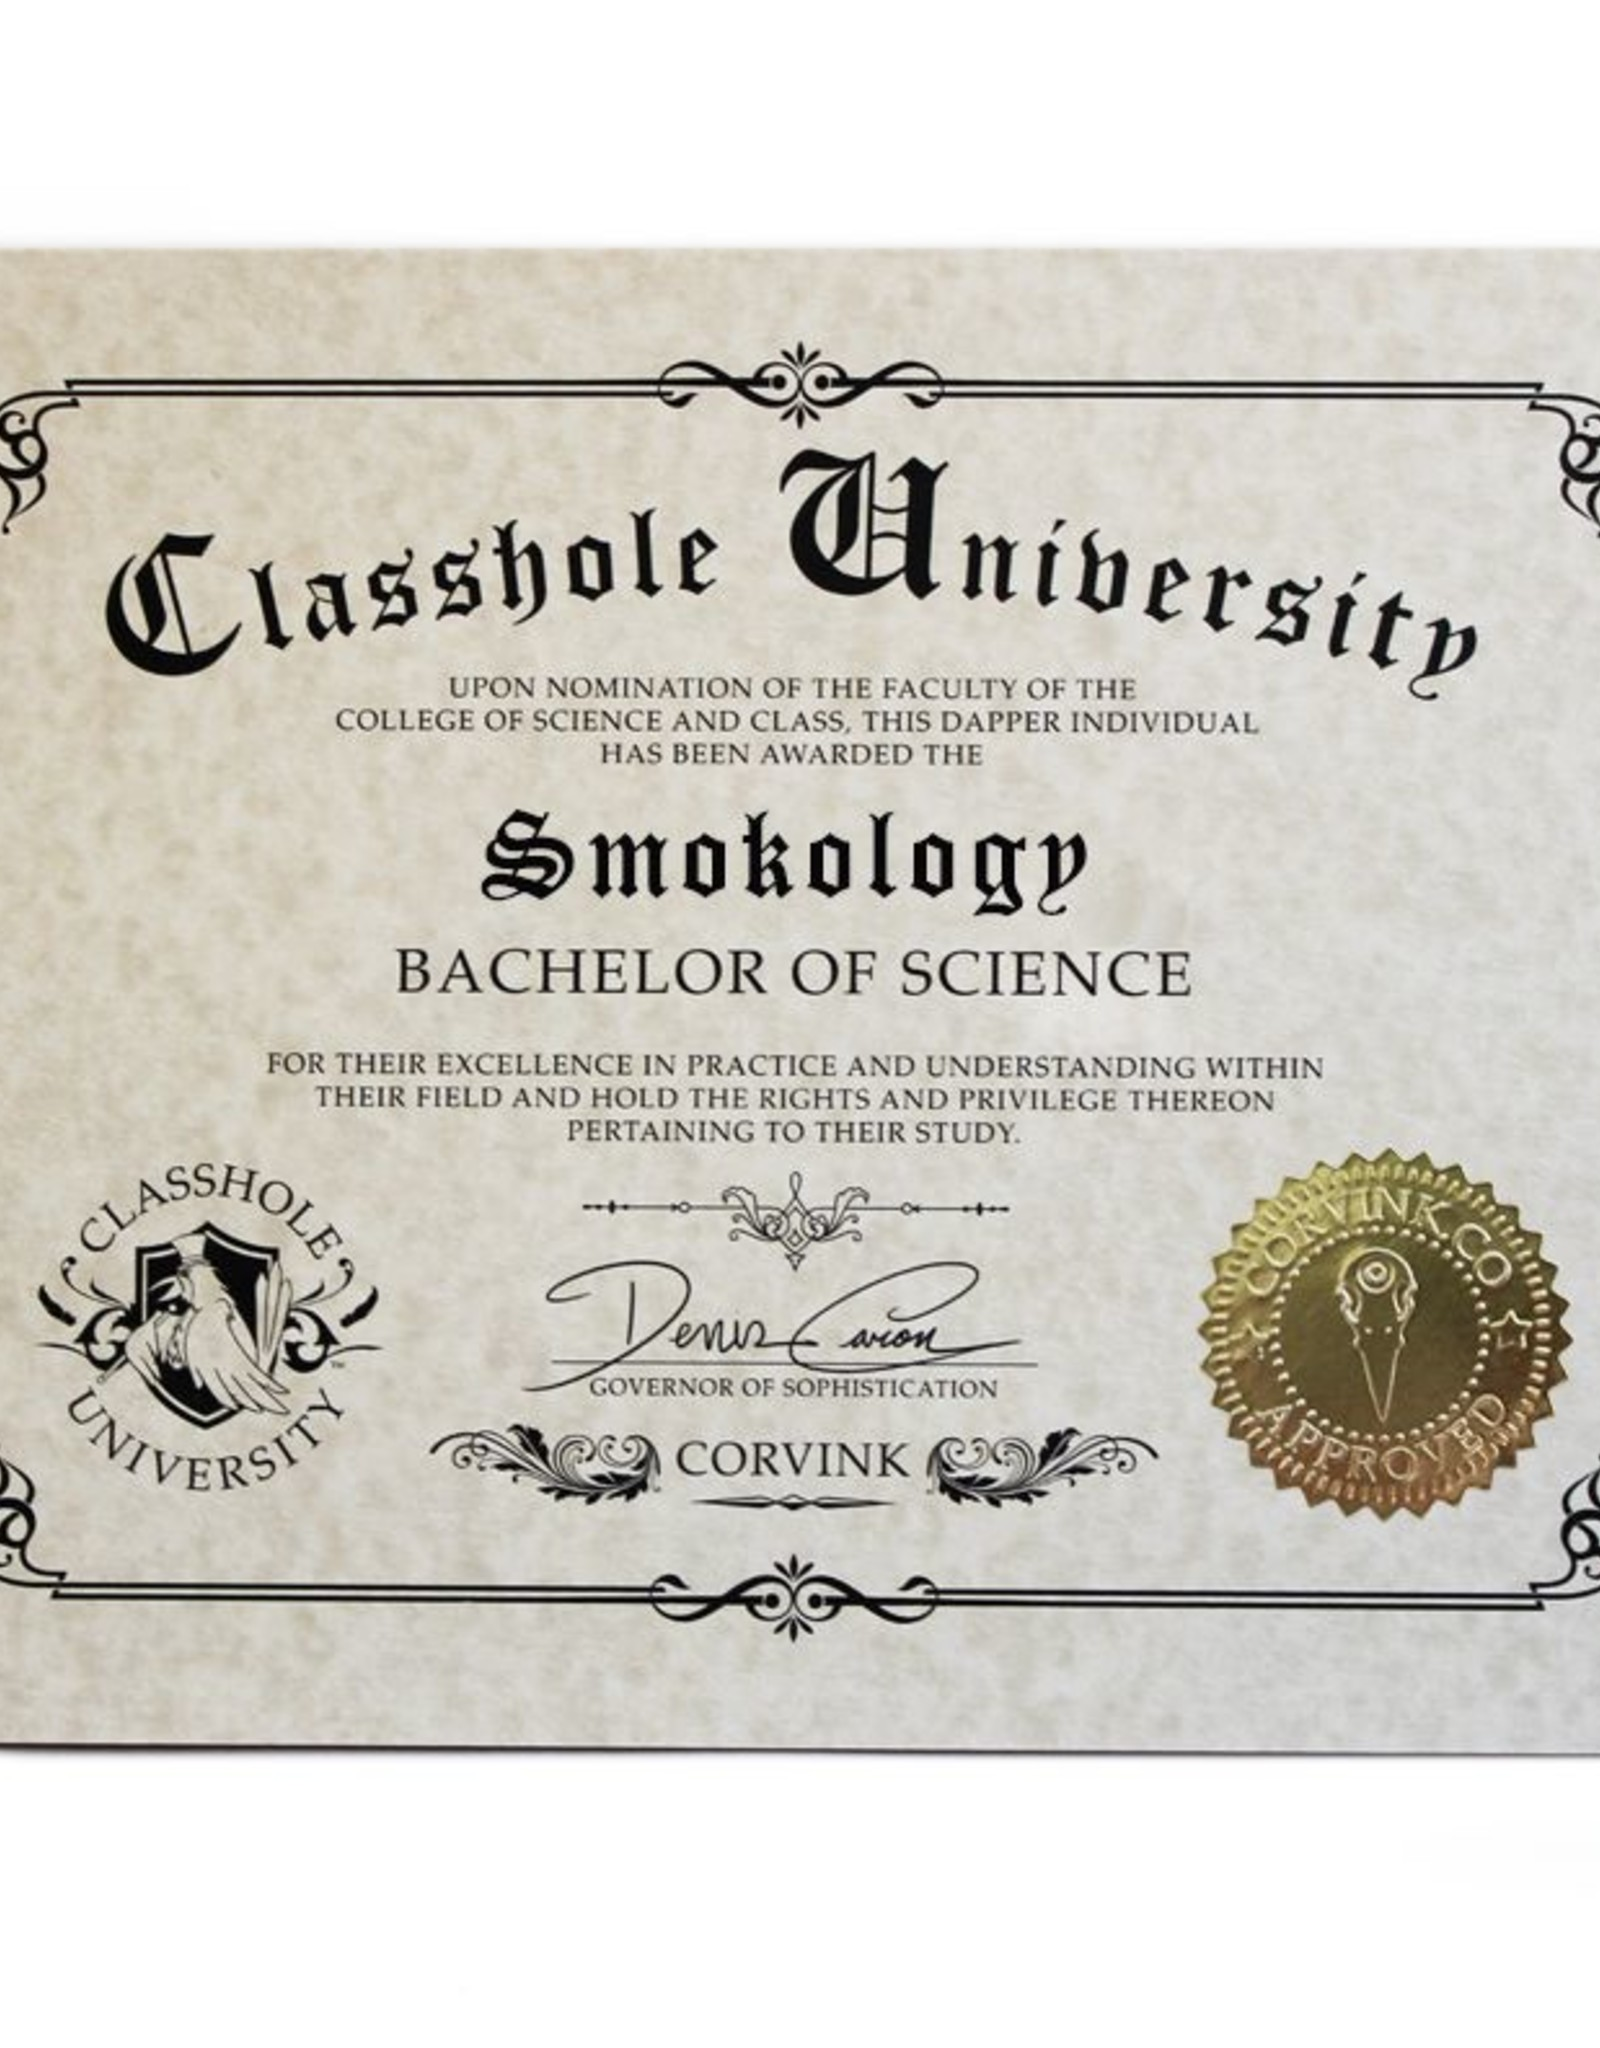 Classhole University BS Diplomas - Smokeology